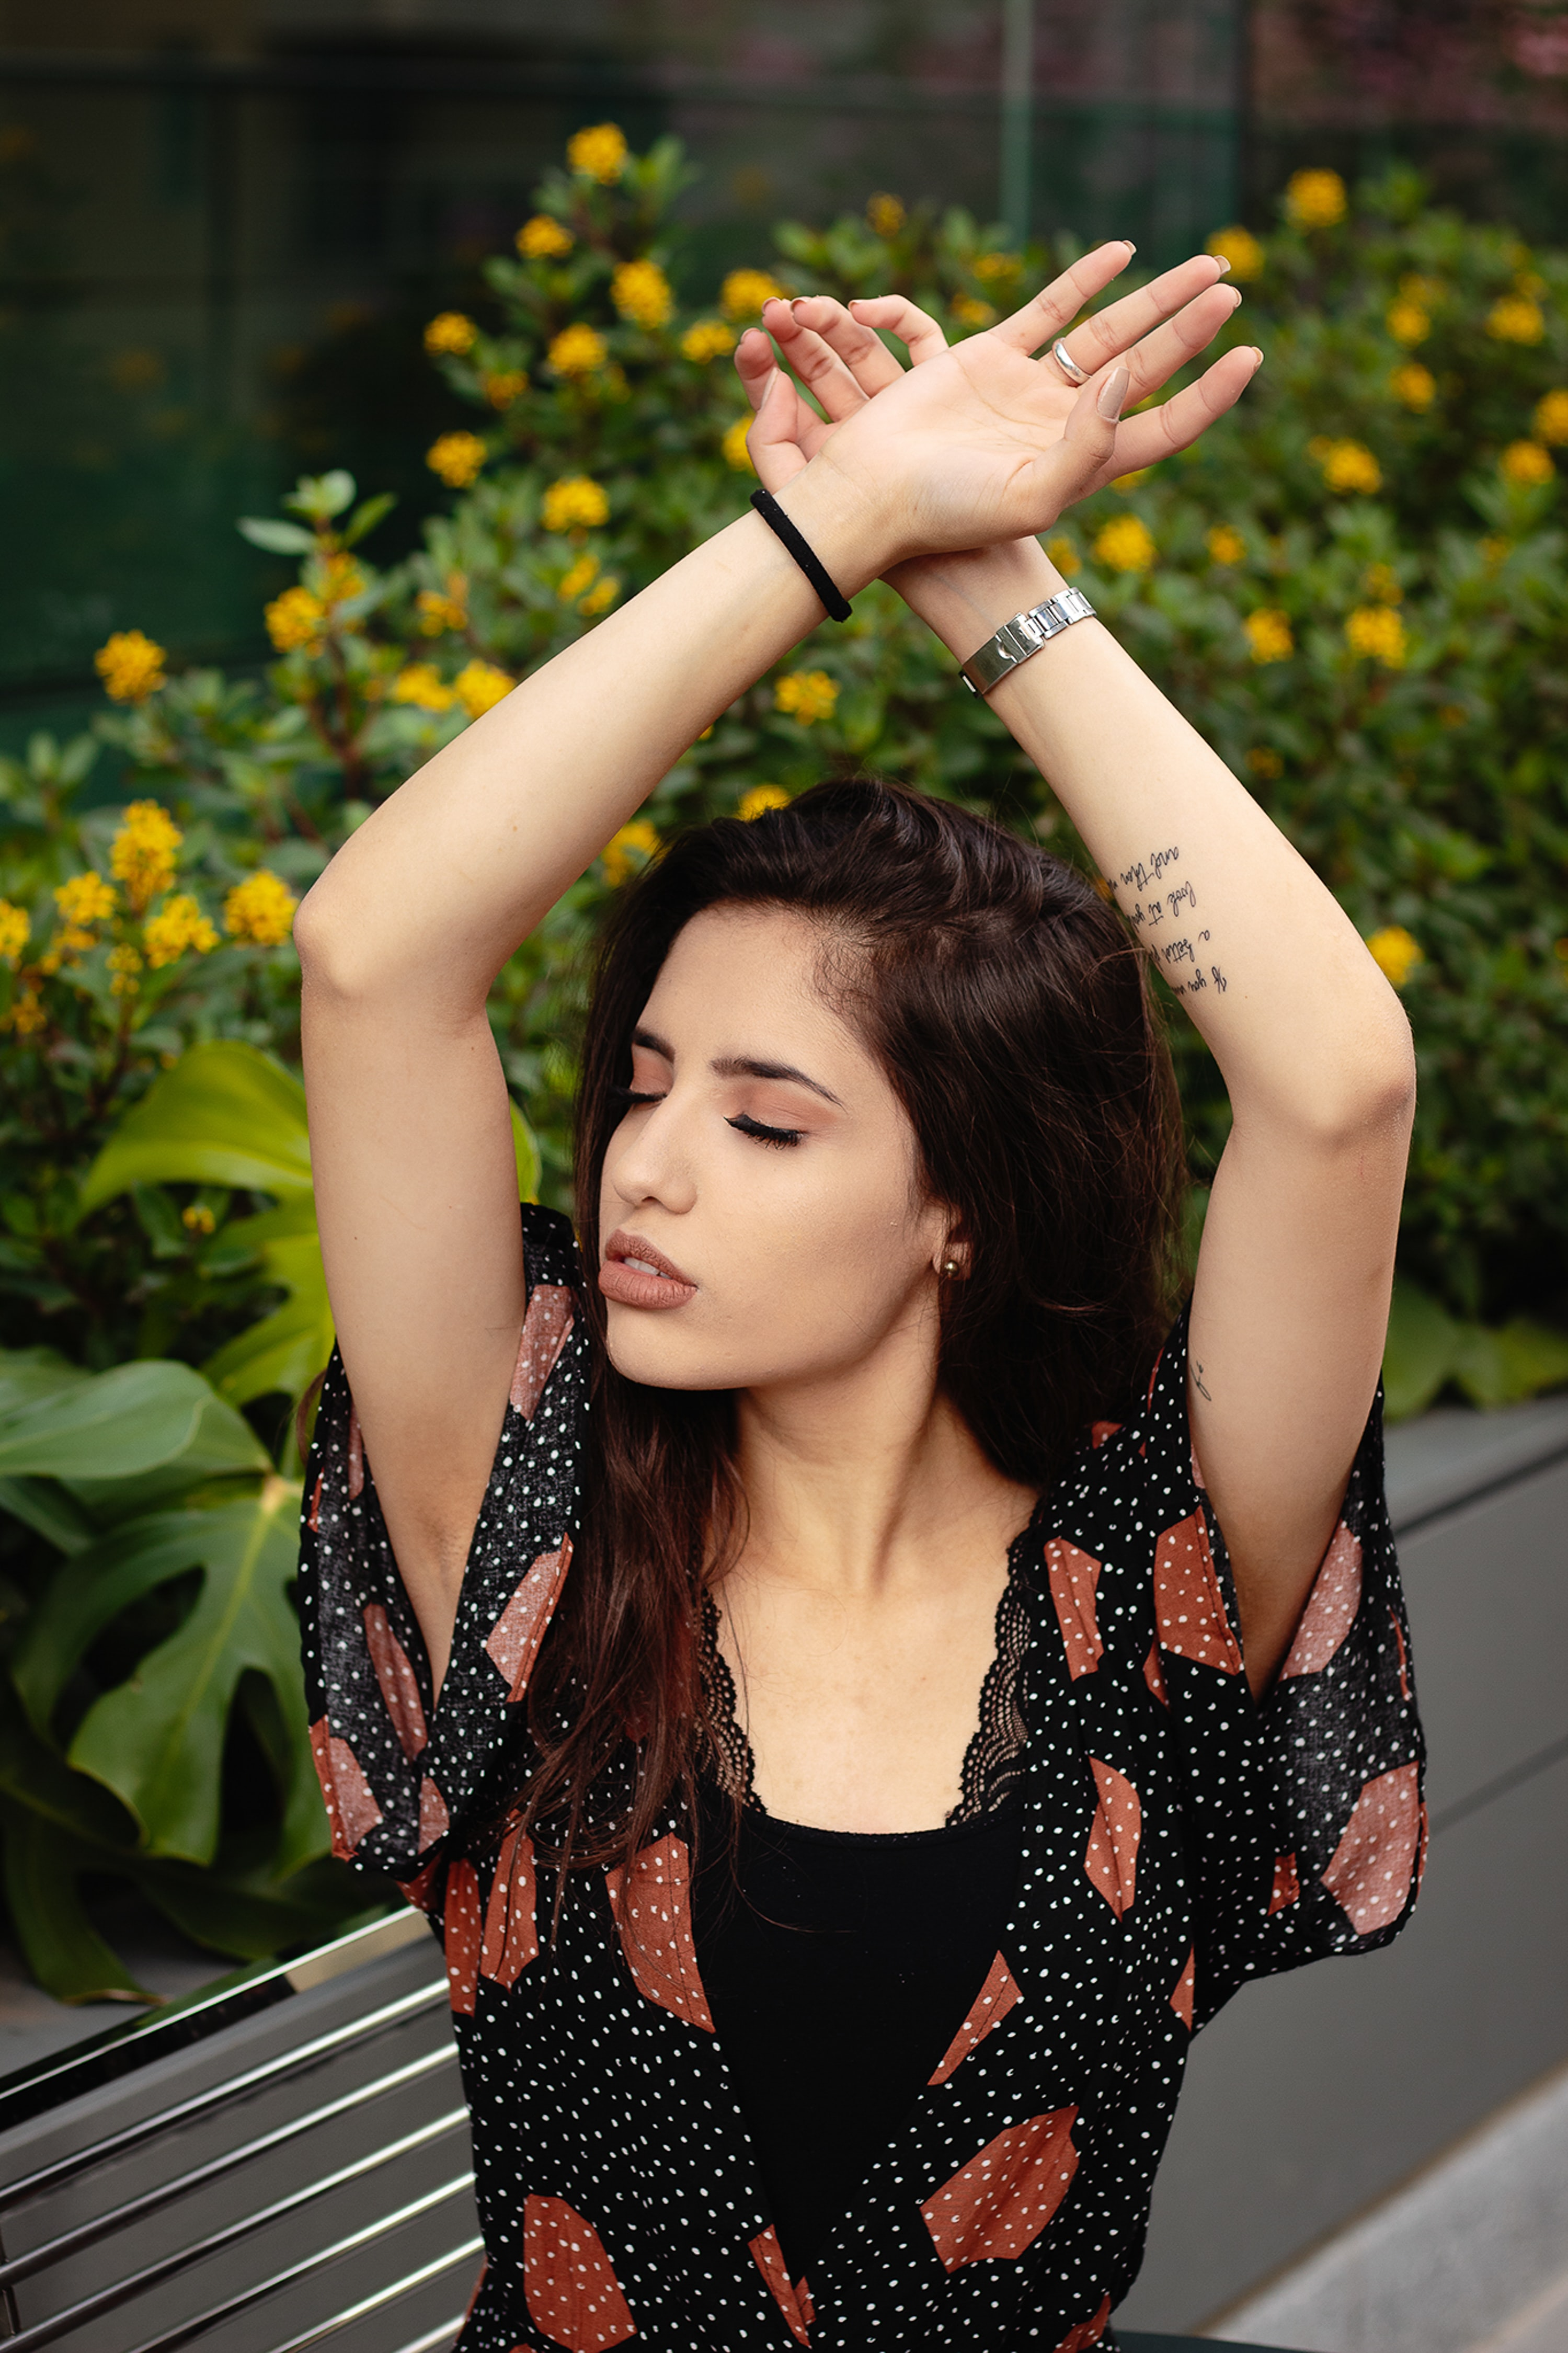 selective focus photo of woman raising her hands